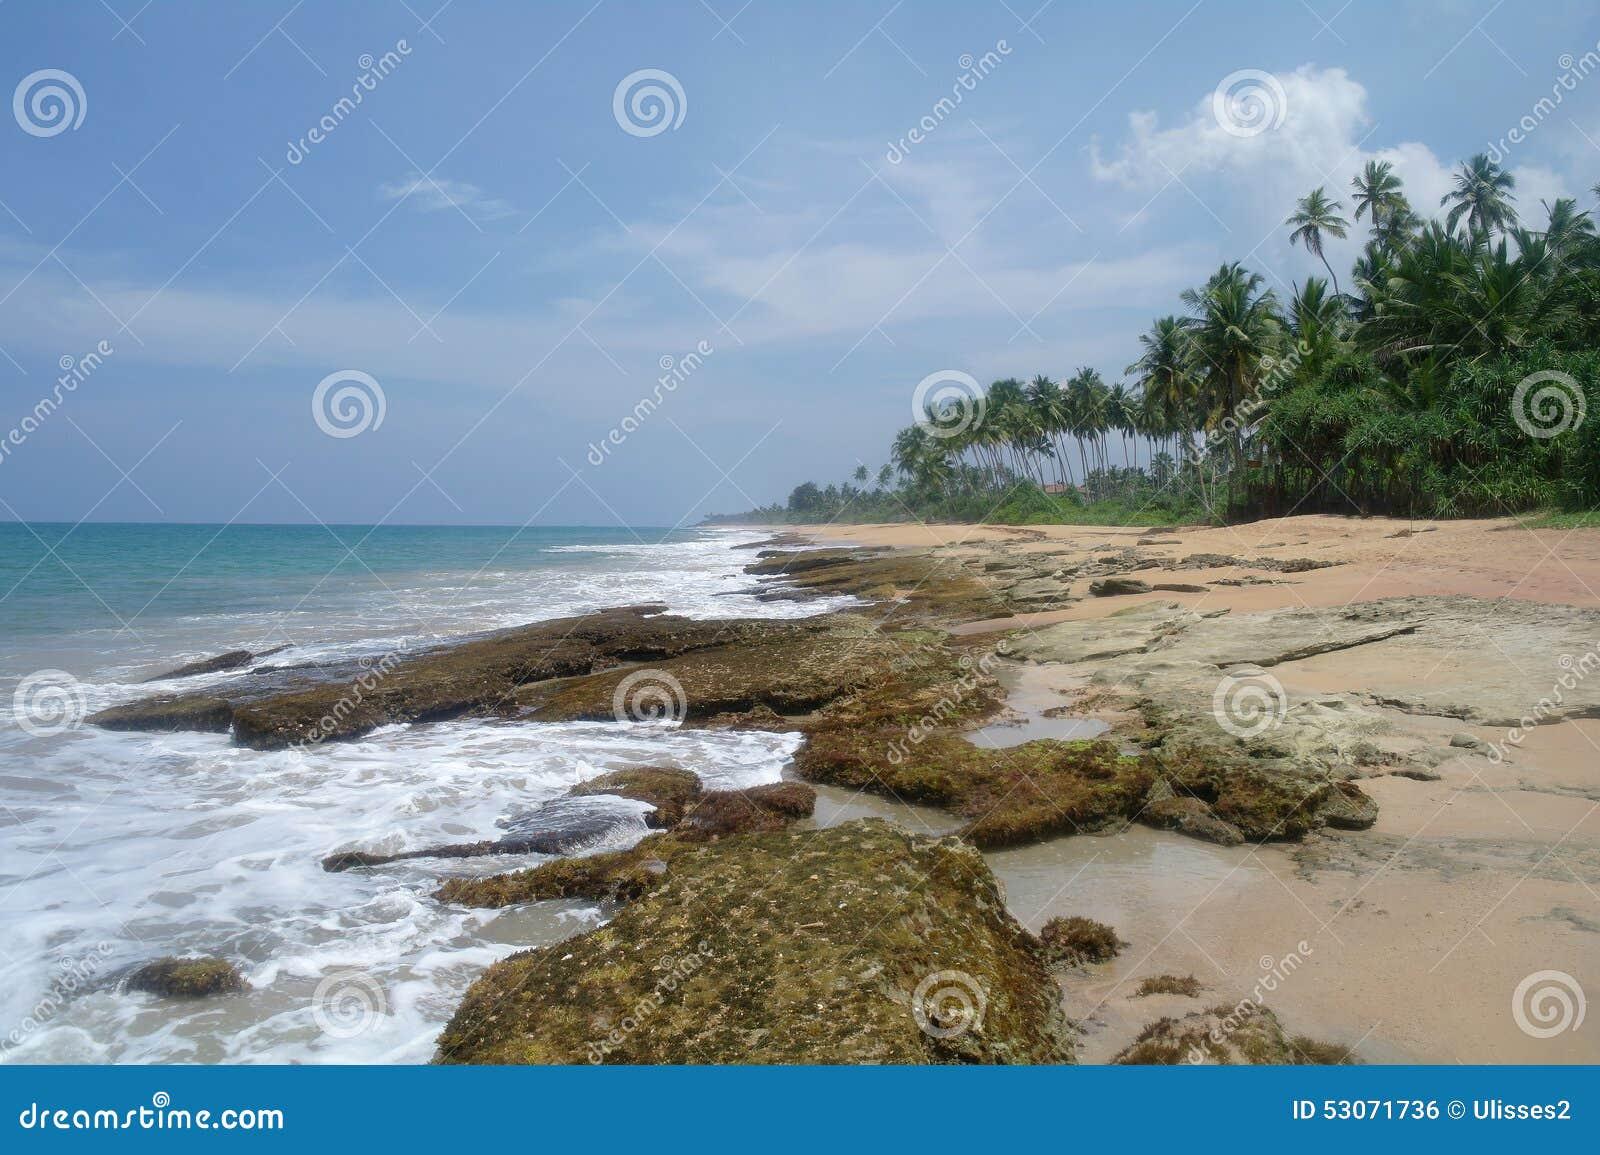 Pierres sur la plage idyllique dans Sri Lanka